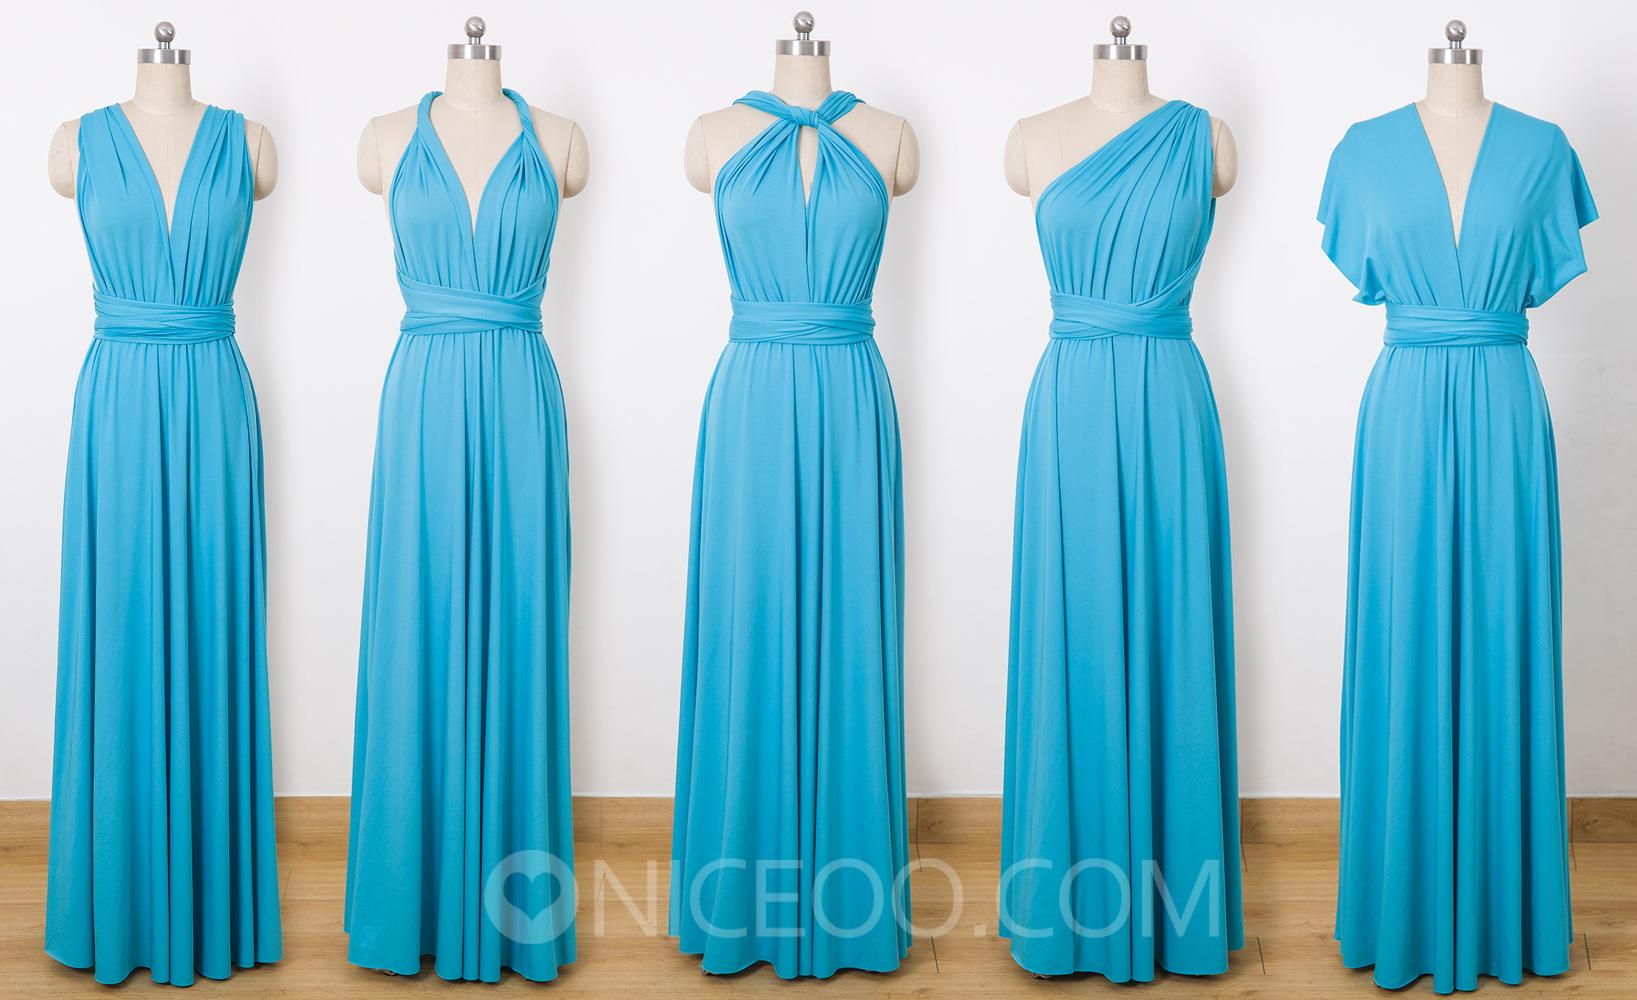 Blue Party Dress, Long Infinity Dress, Infinity Wrap Dress ...